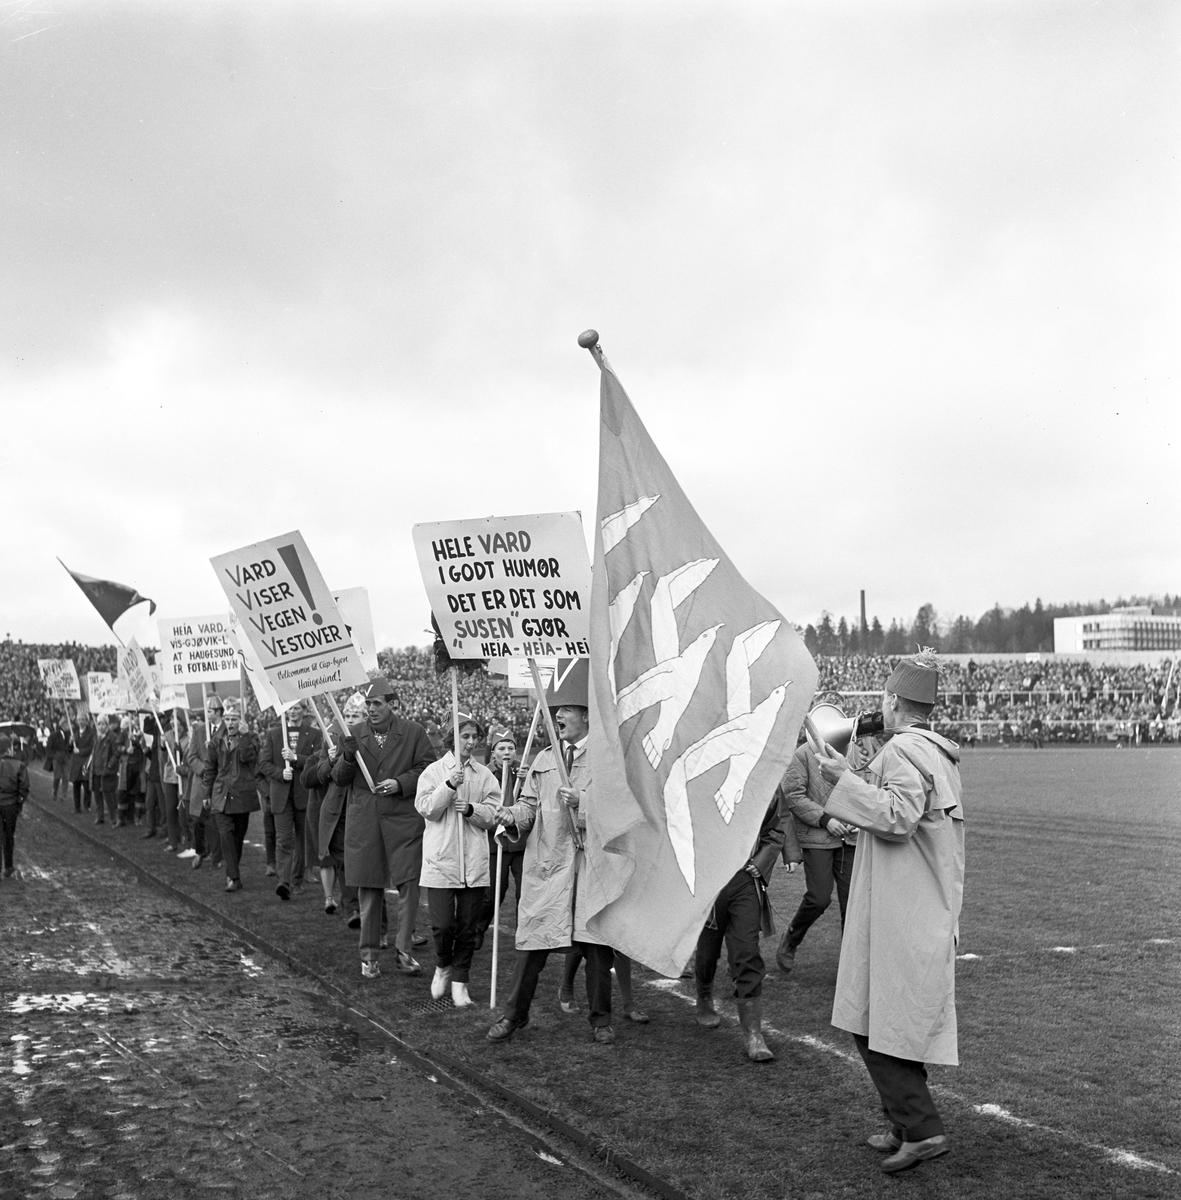 Fotball, cupfinale på Ullevål stadion mellom Gjøvik-Lyn og Vard,  oktober 1962